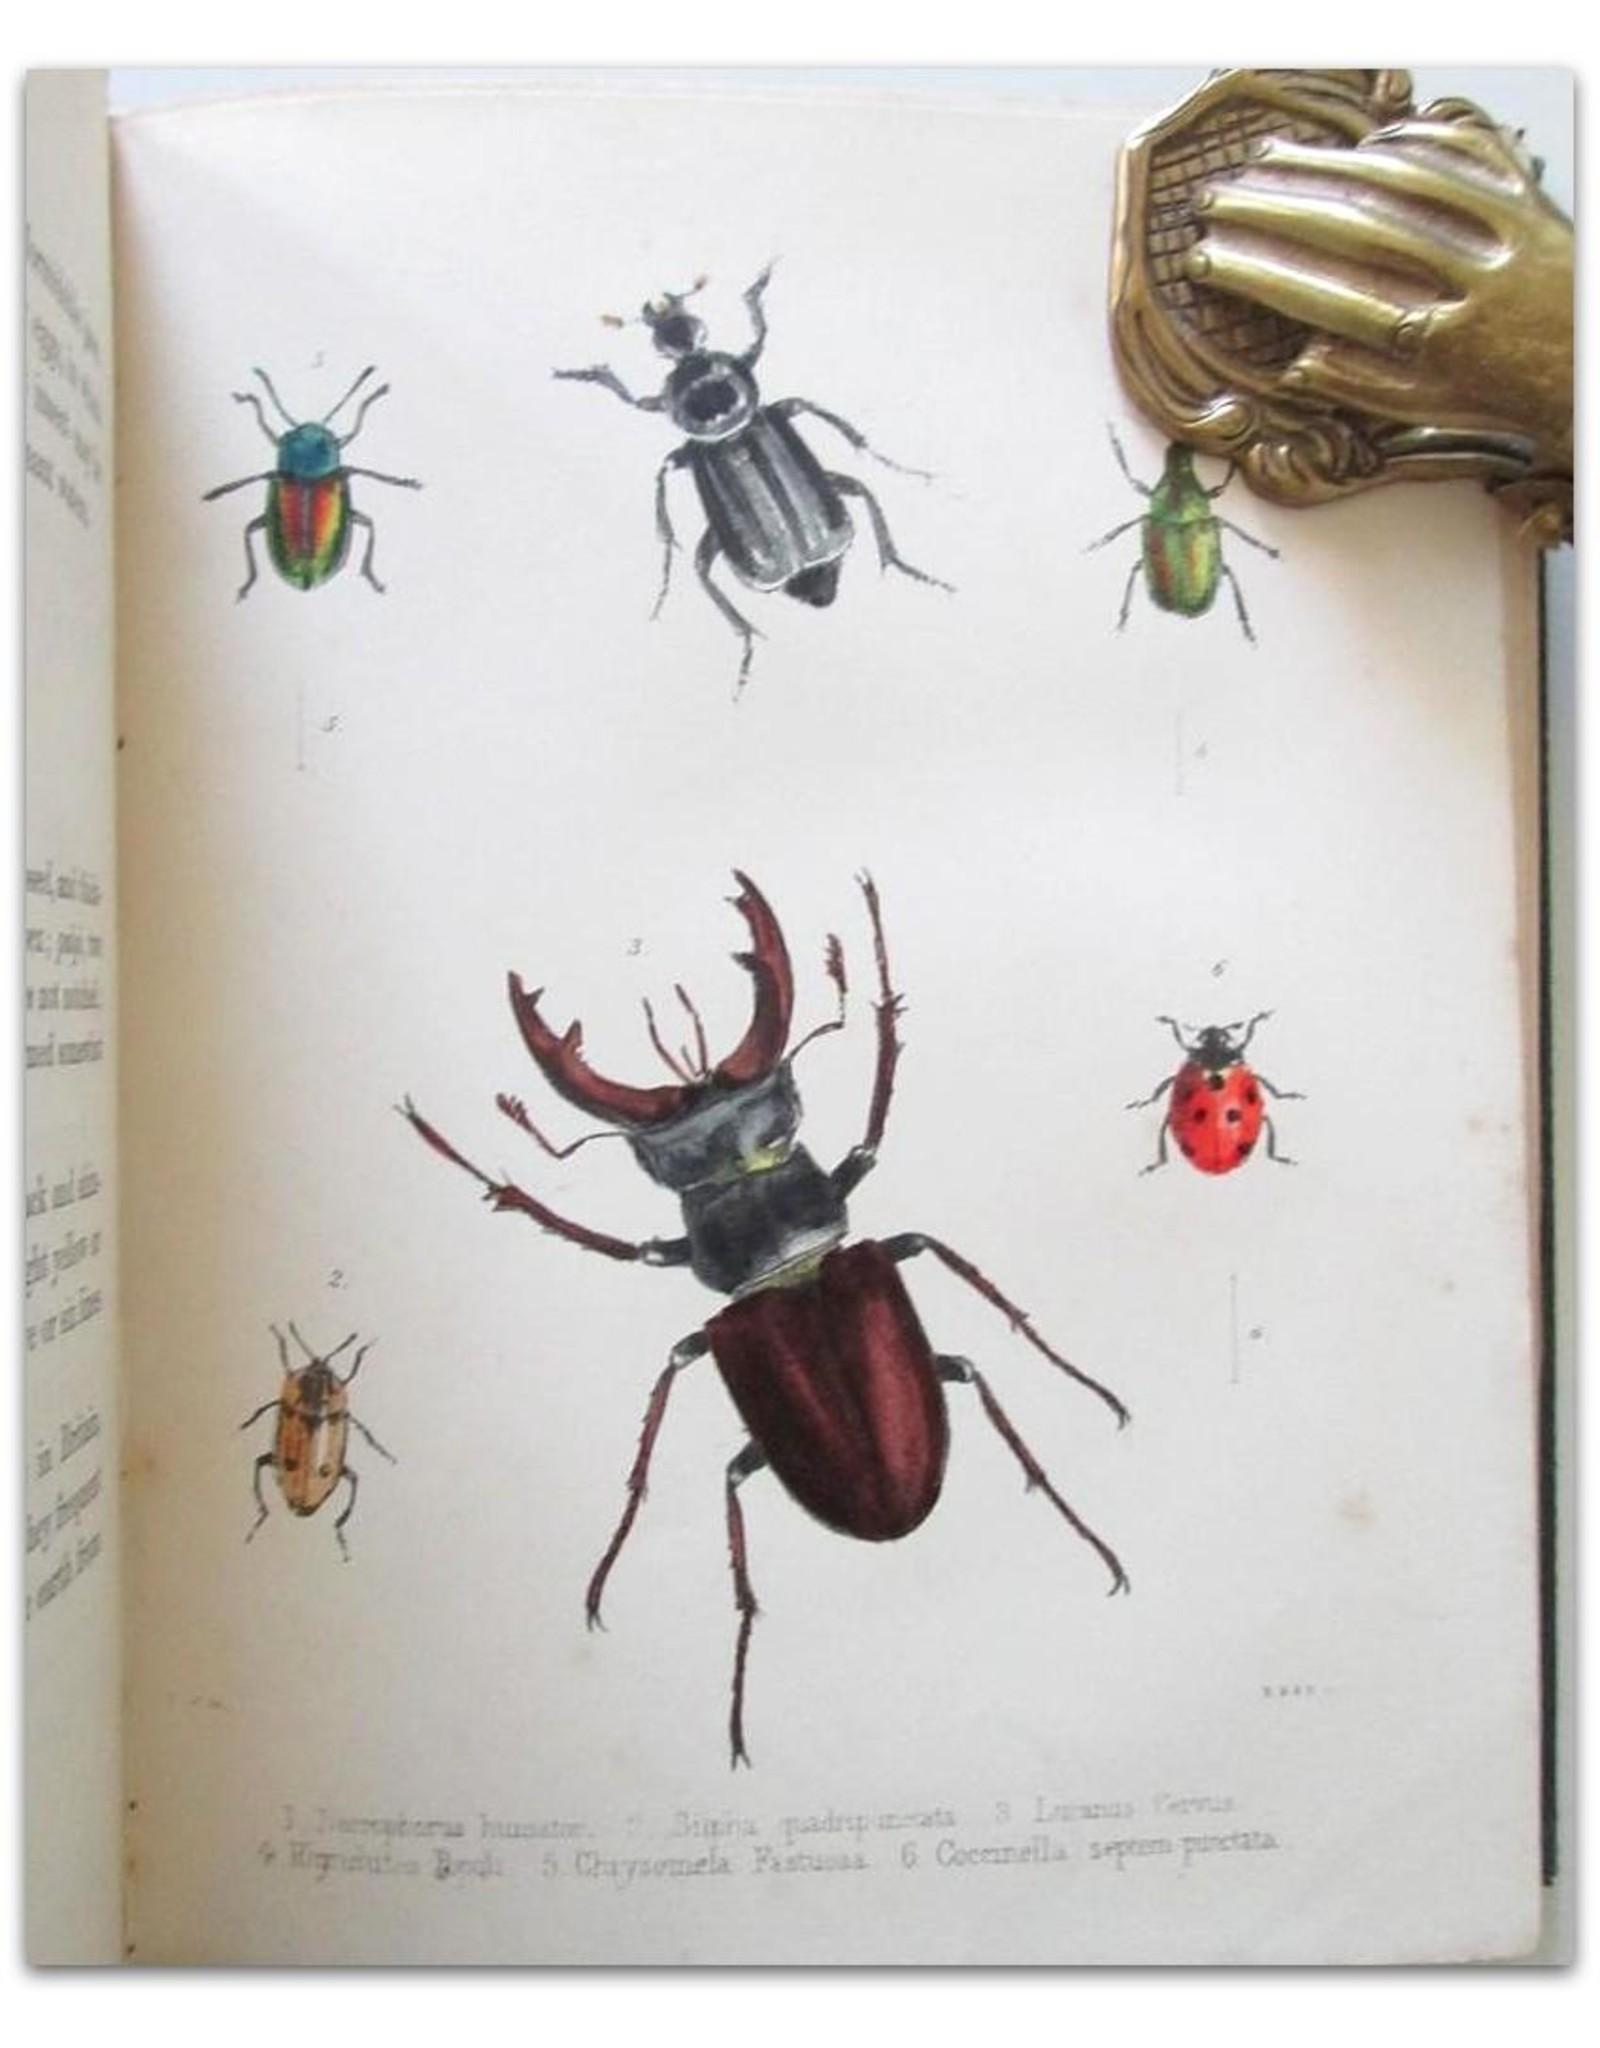 Maria E. Catlow - Popular British Entomology